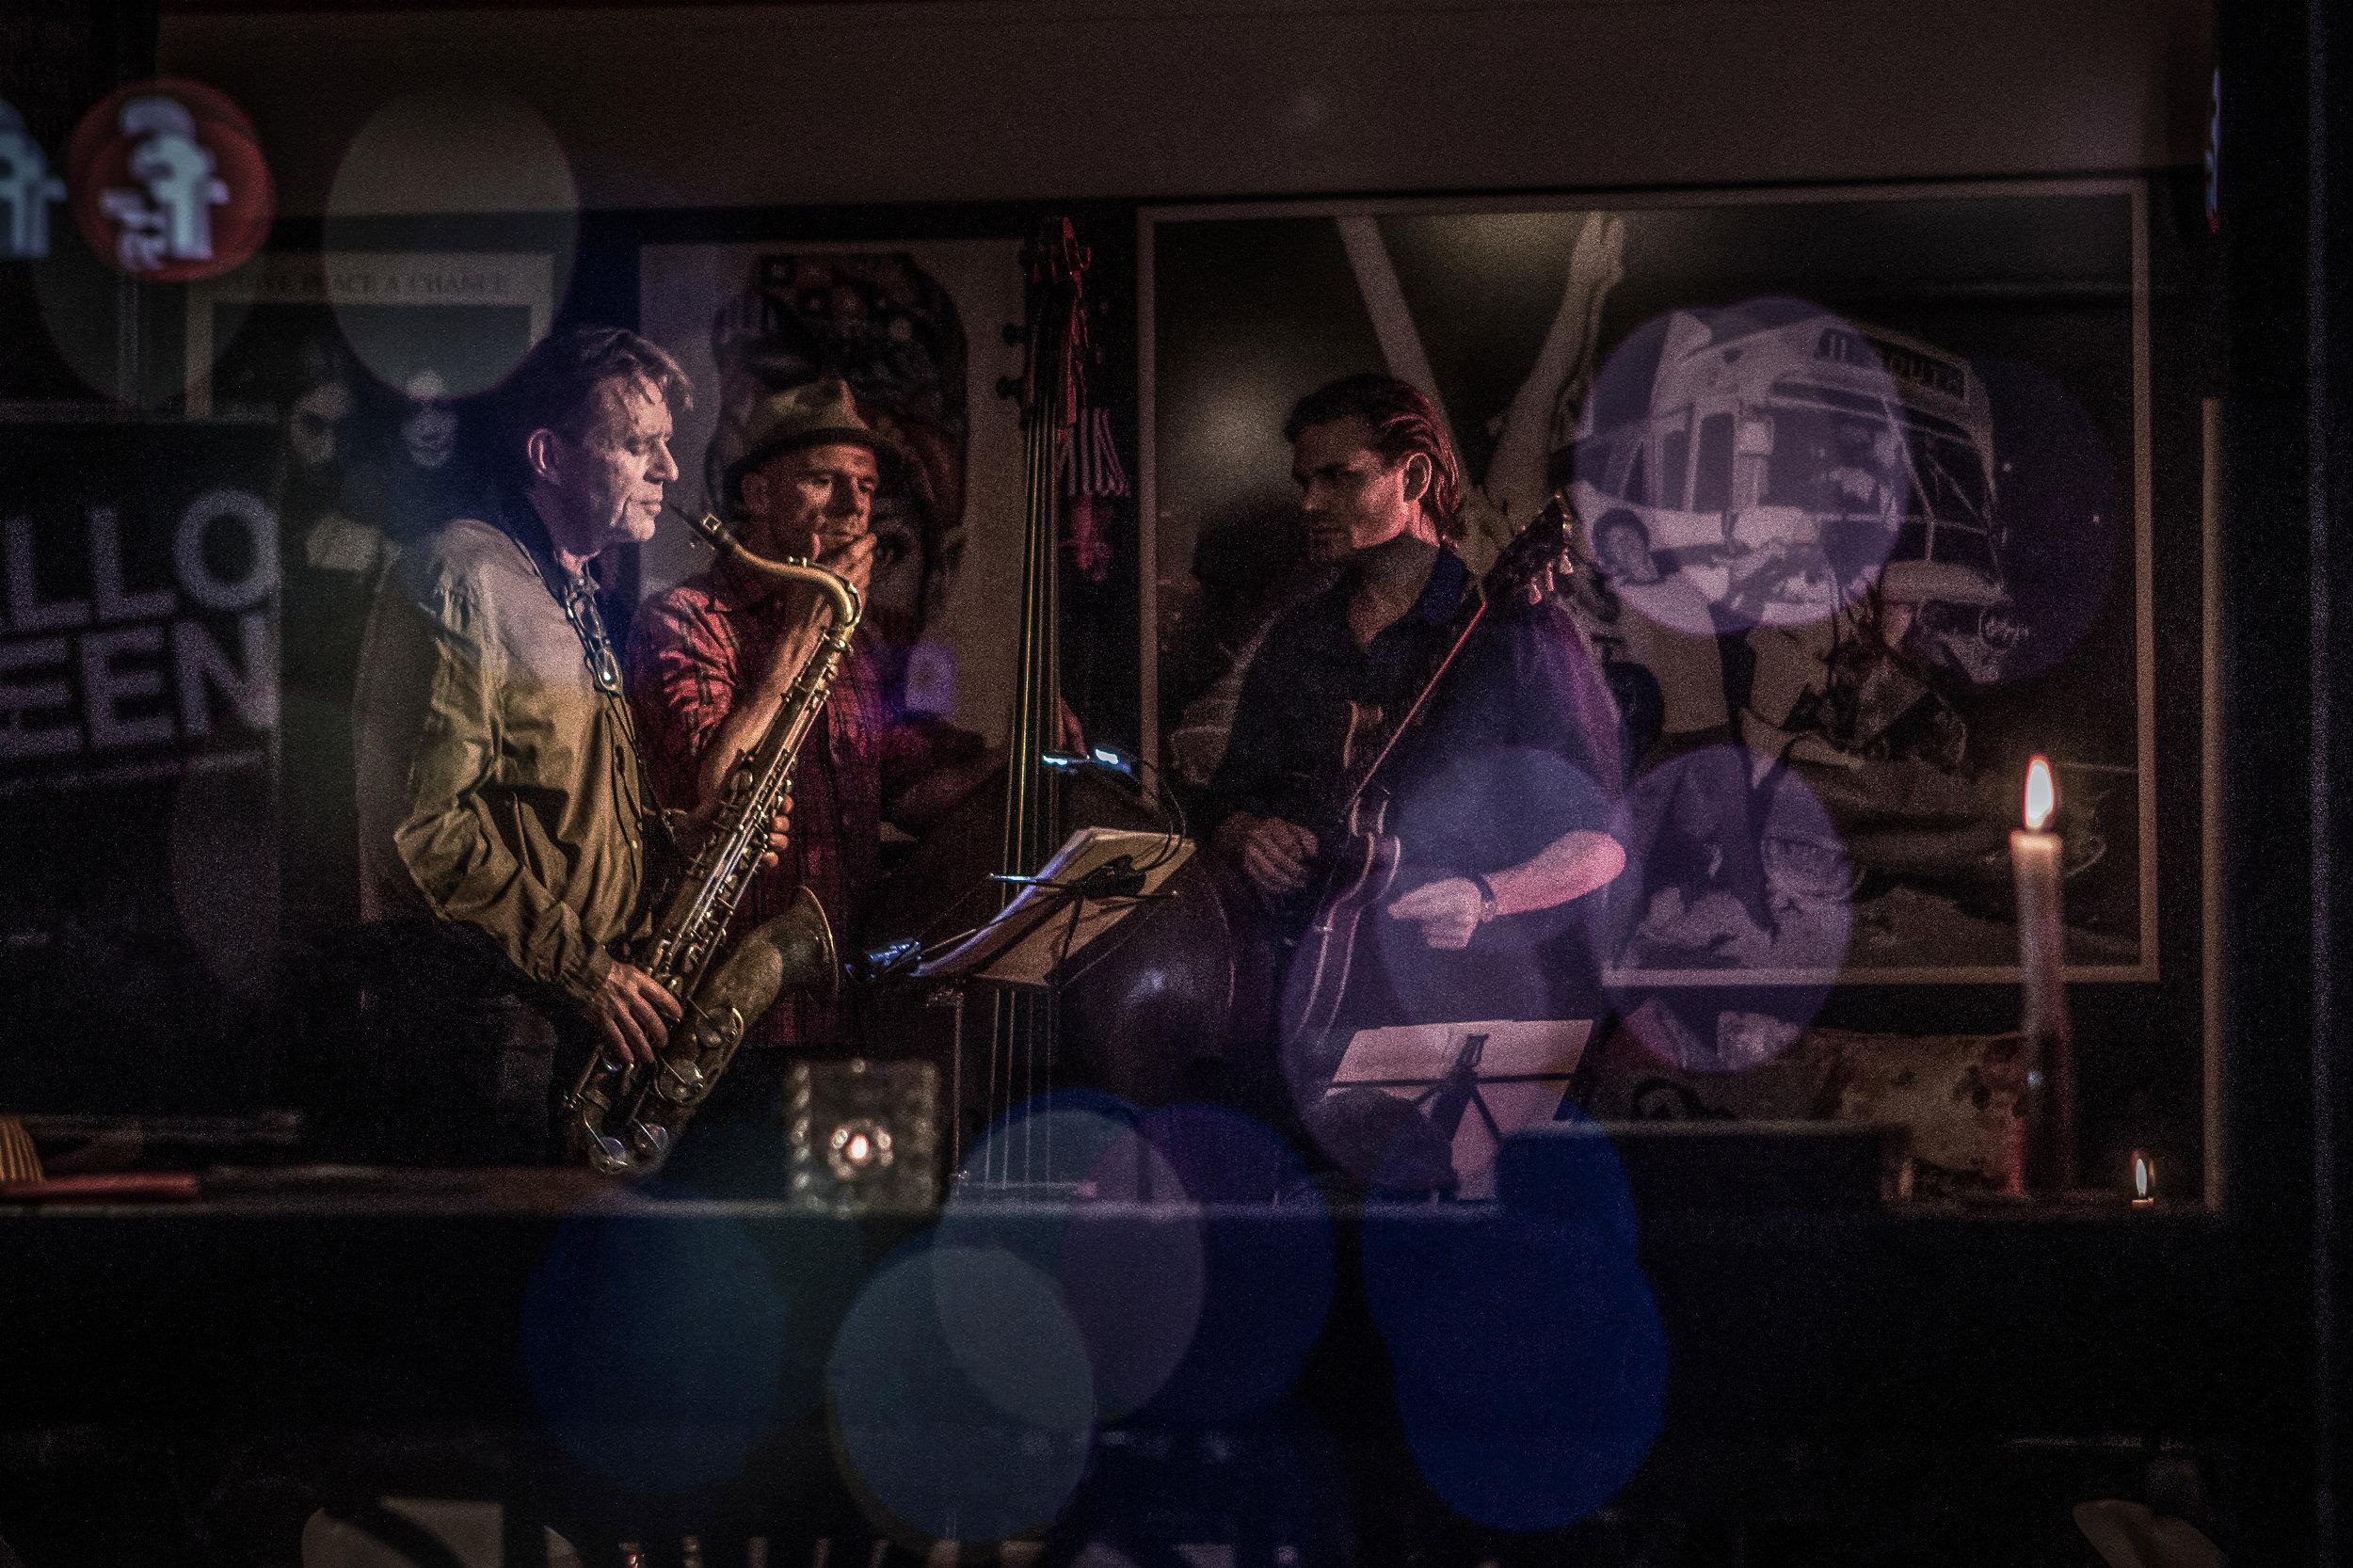 Jens Fisker Trio, Café Ulla Terkelsen